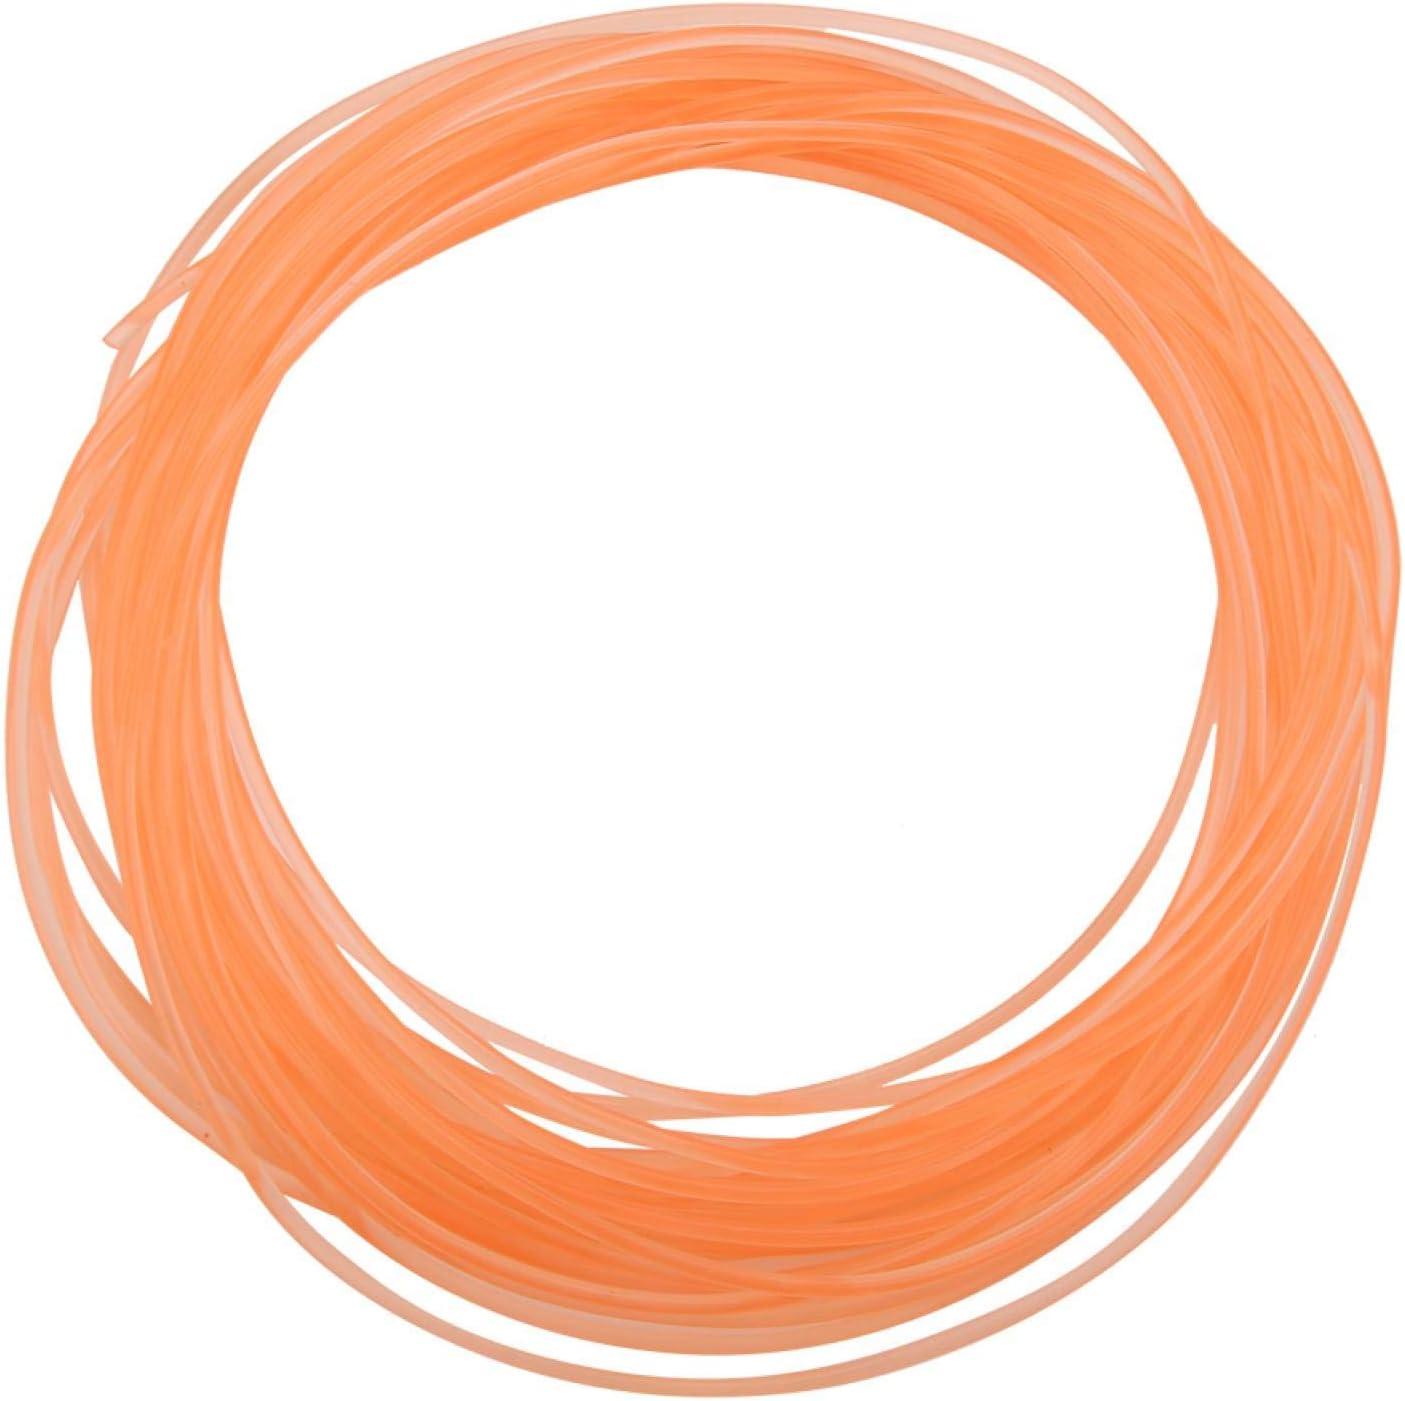 Max 68% OFF Round Belt Orange Smooth PU Columbus Mall for Polyurethane Surface